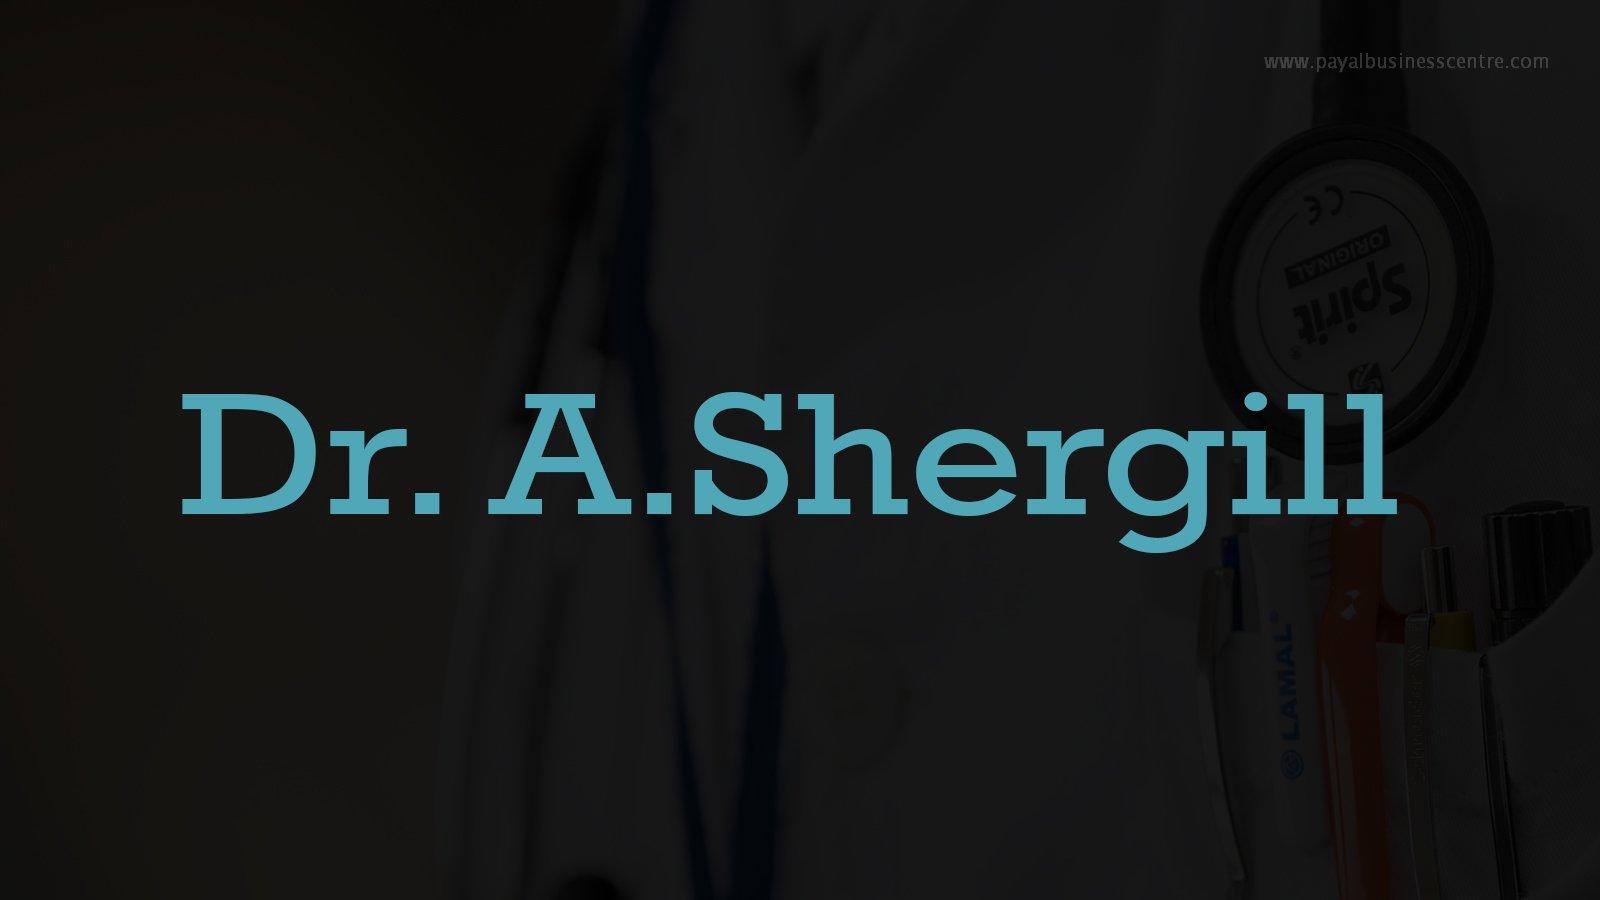 Dr. A.Shergill